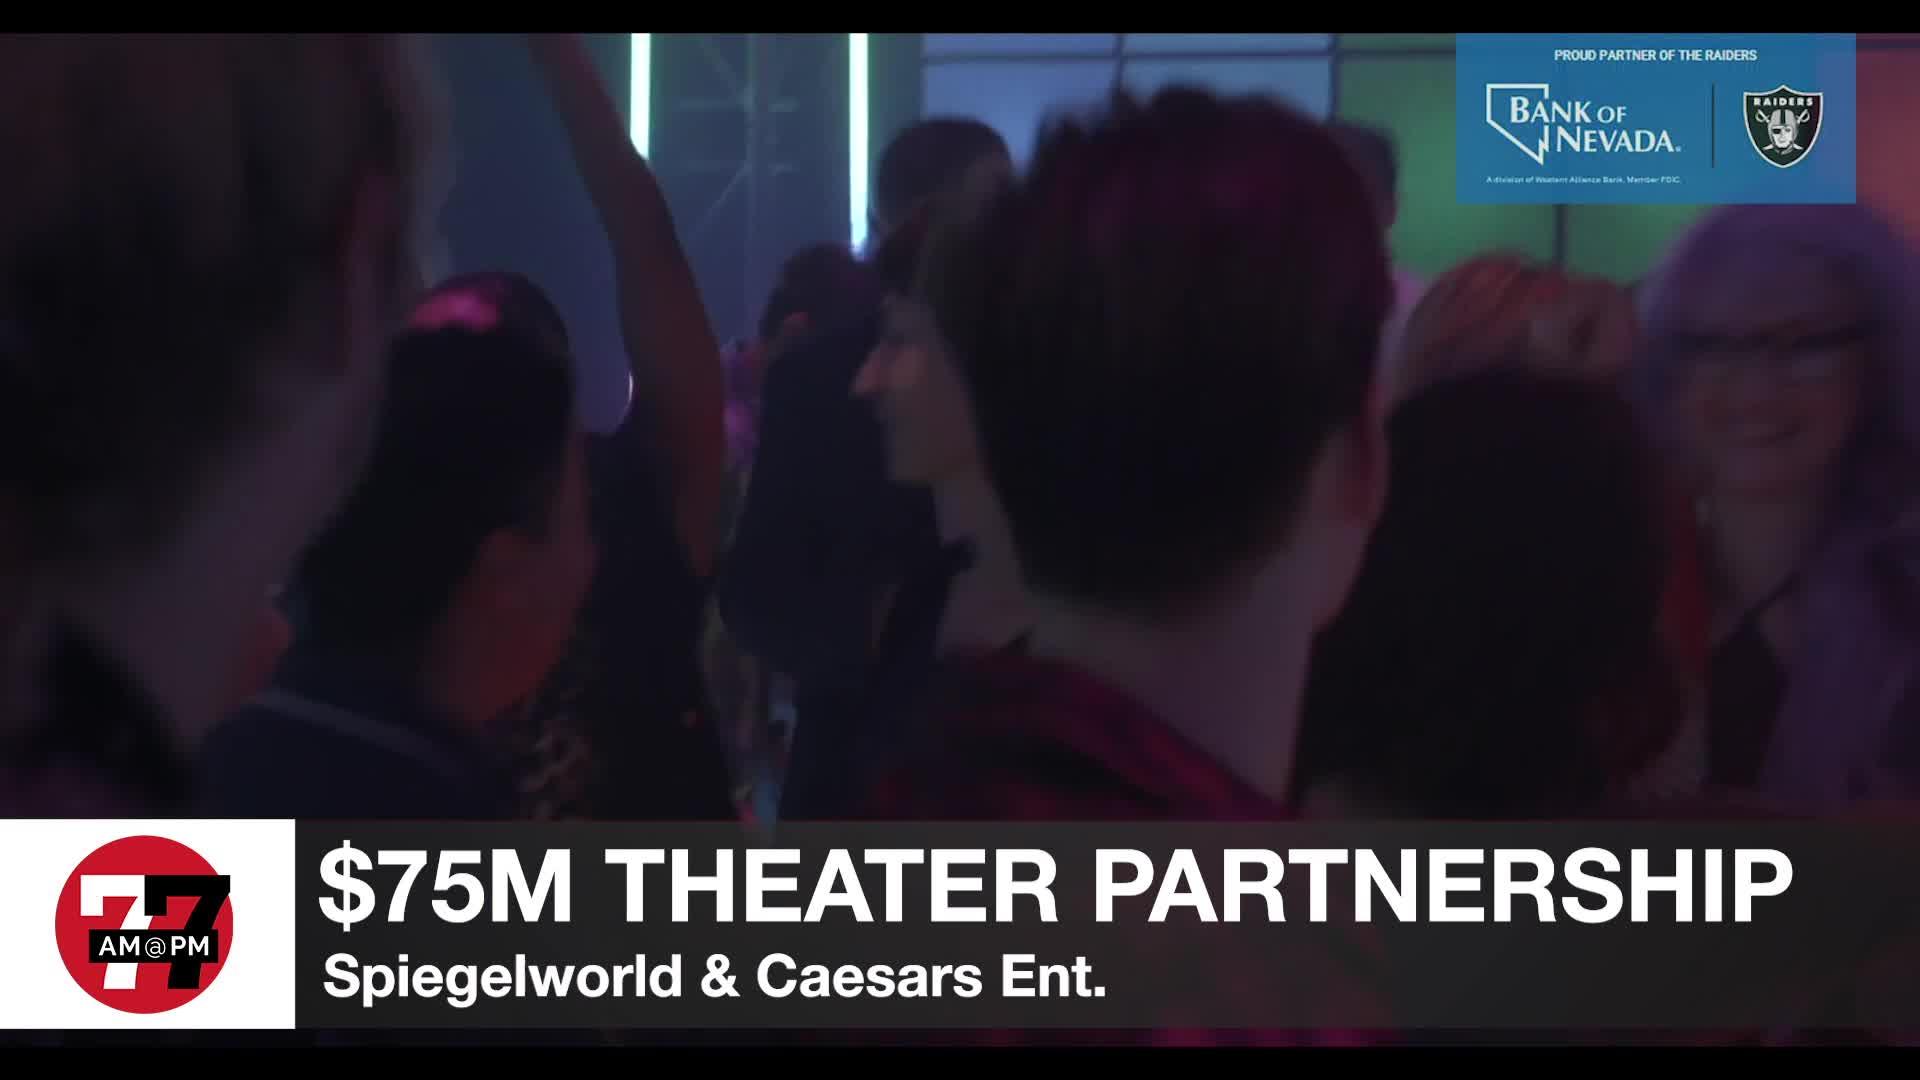 7@7PM $75M Theater Partnership